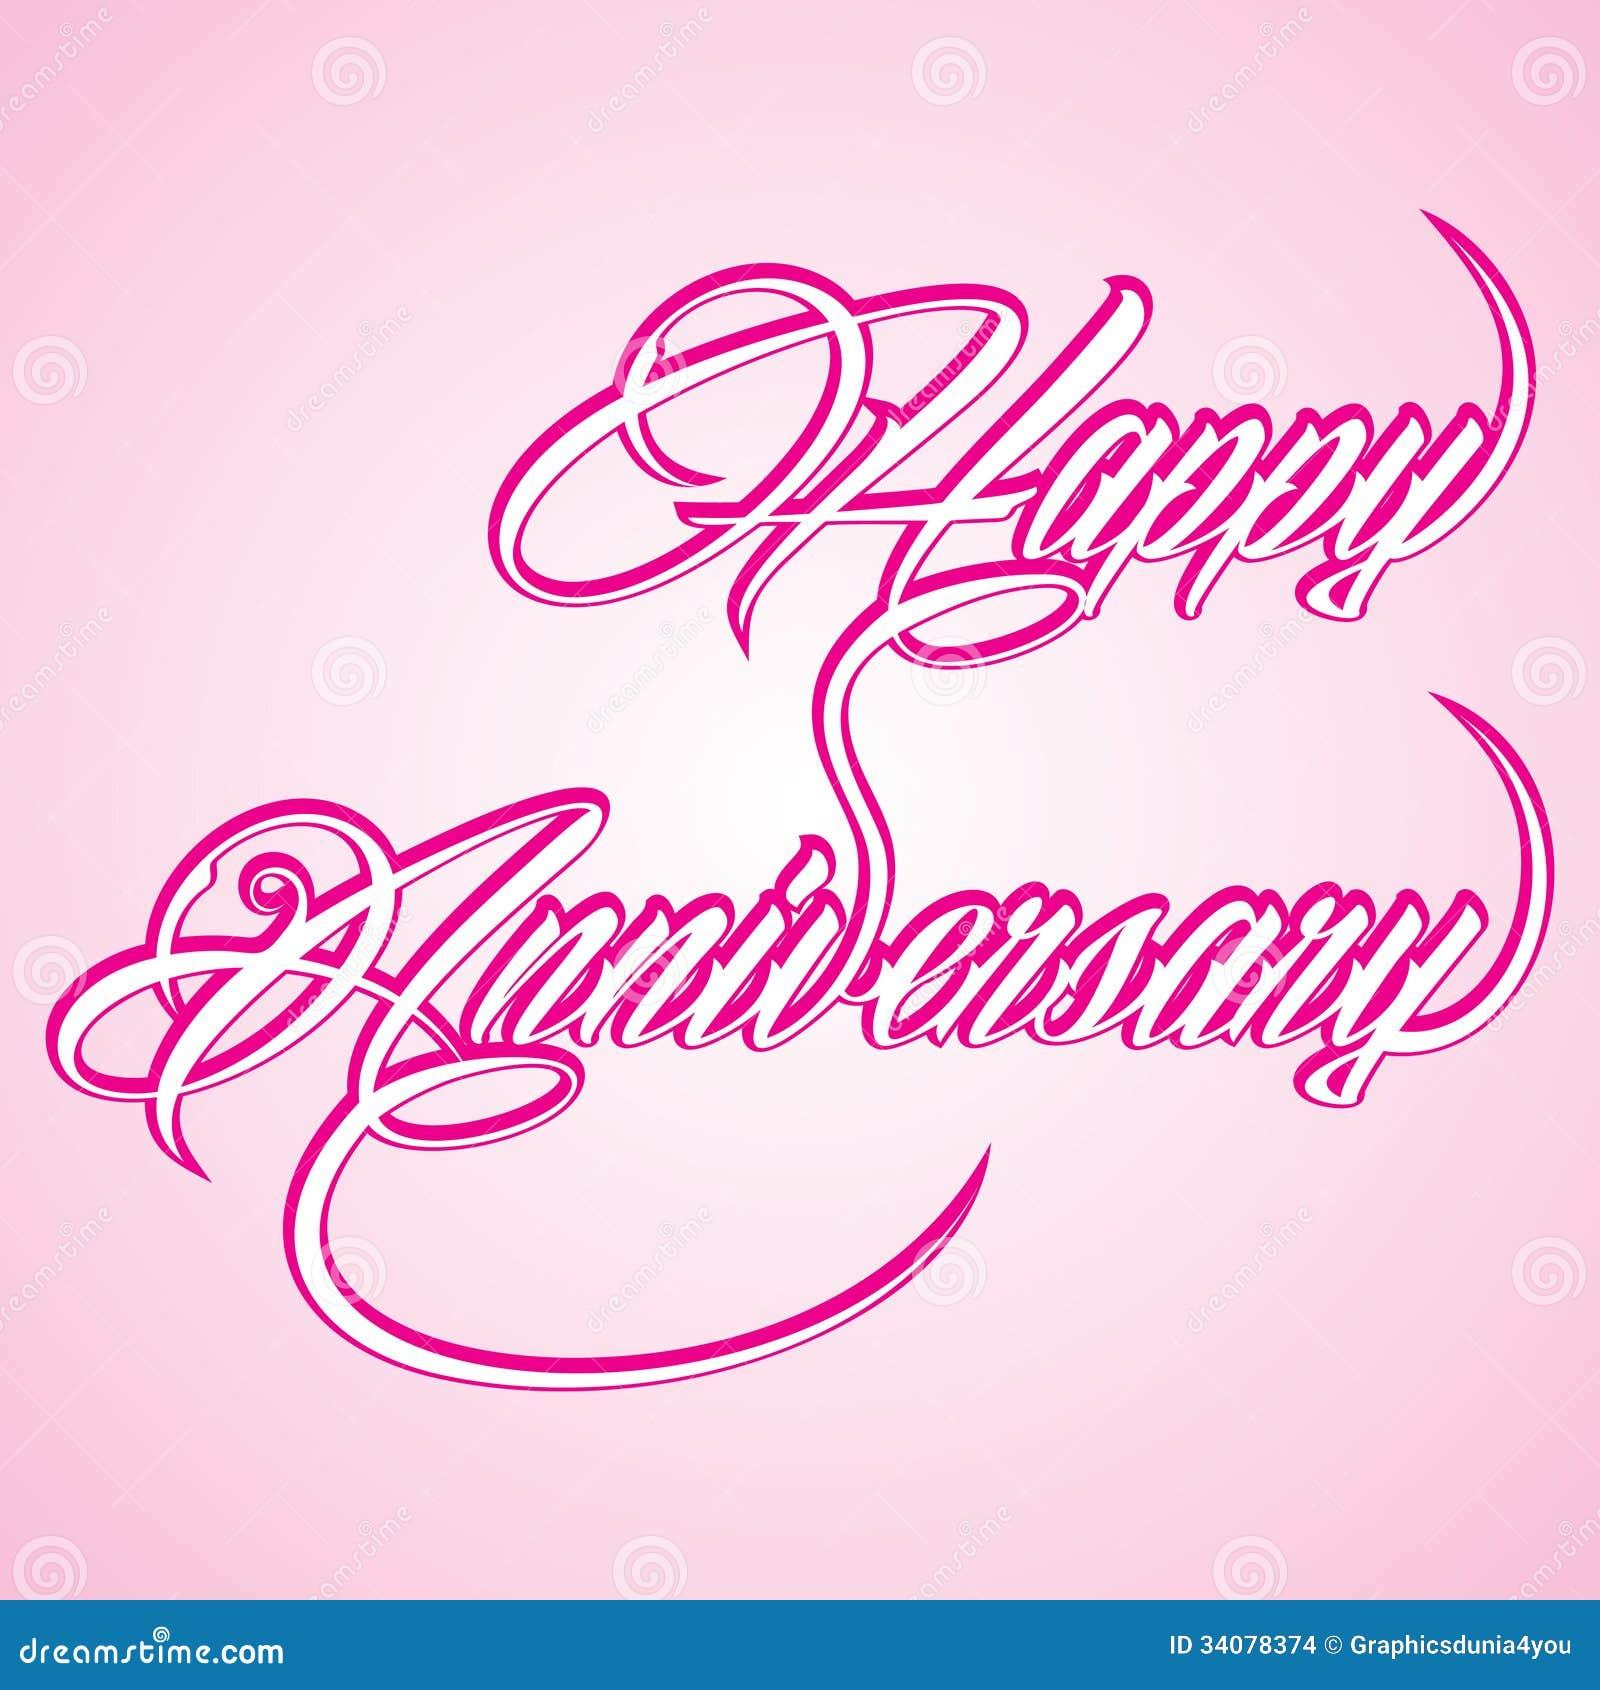 Creative Calligraphy Of Text Happy Anniversary Stock